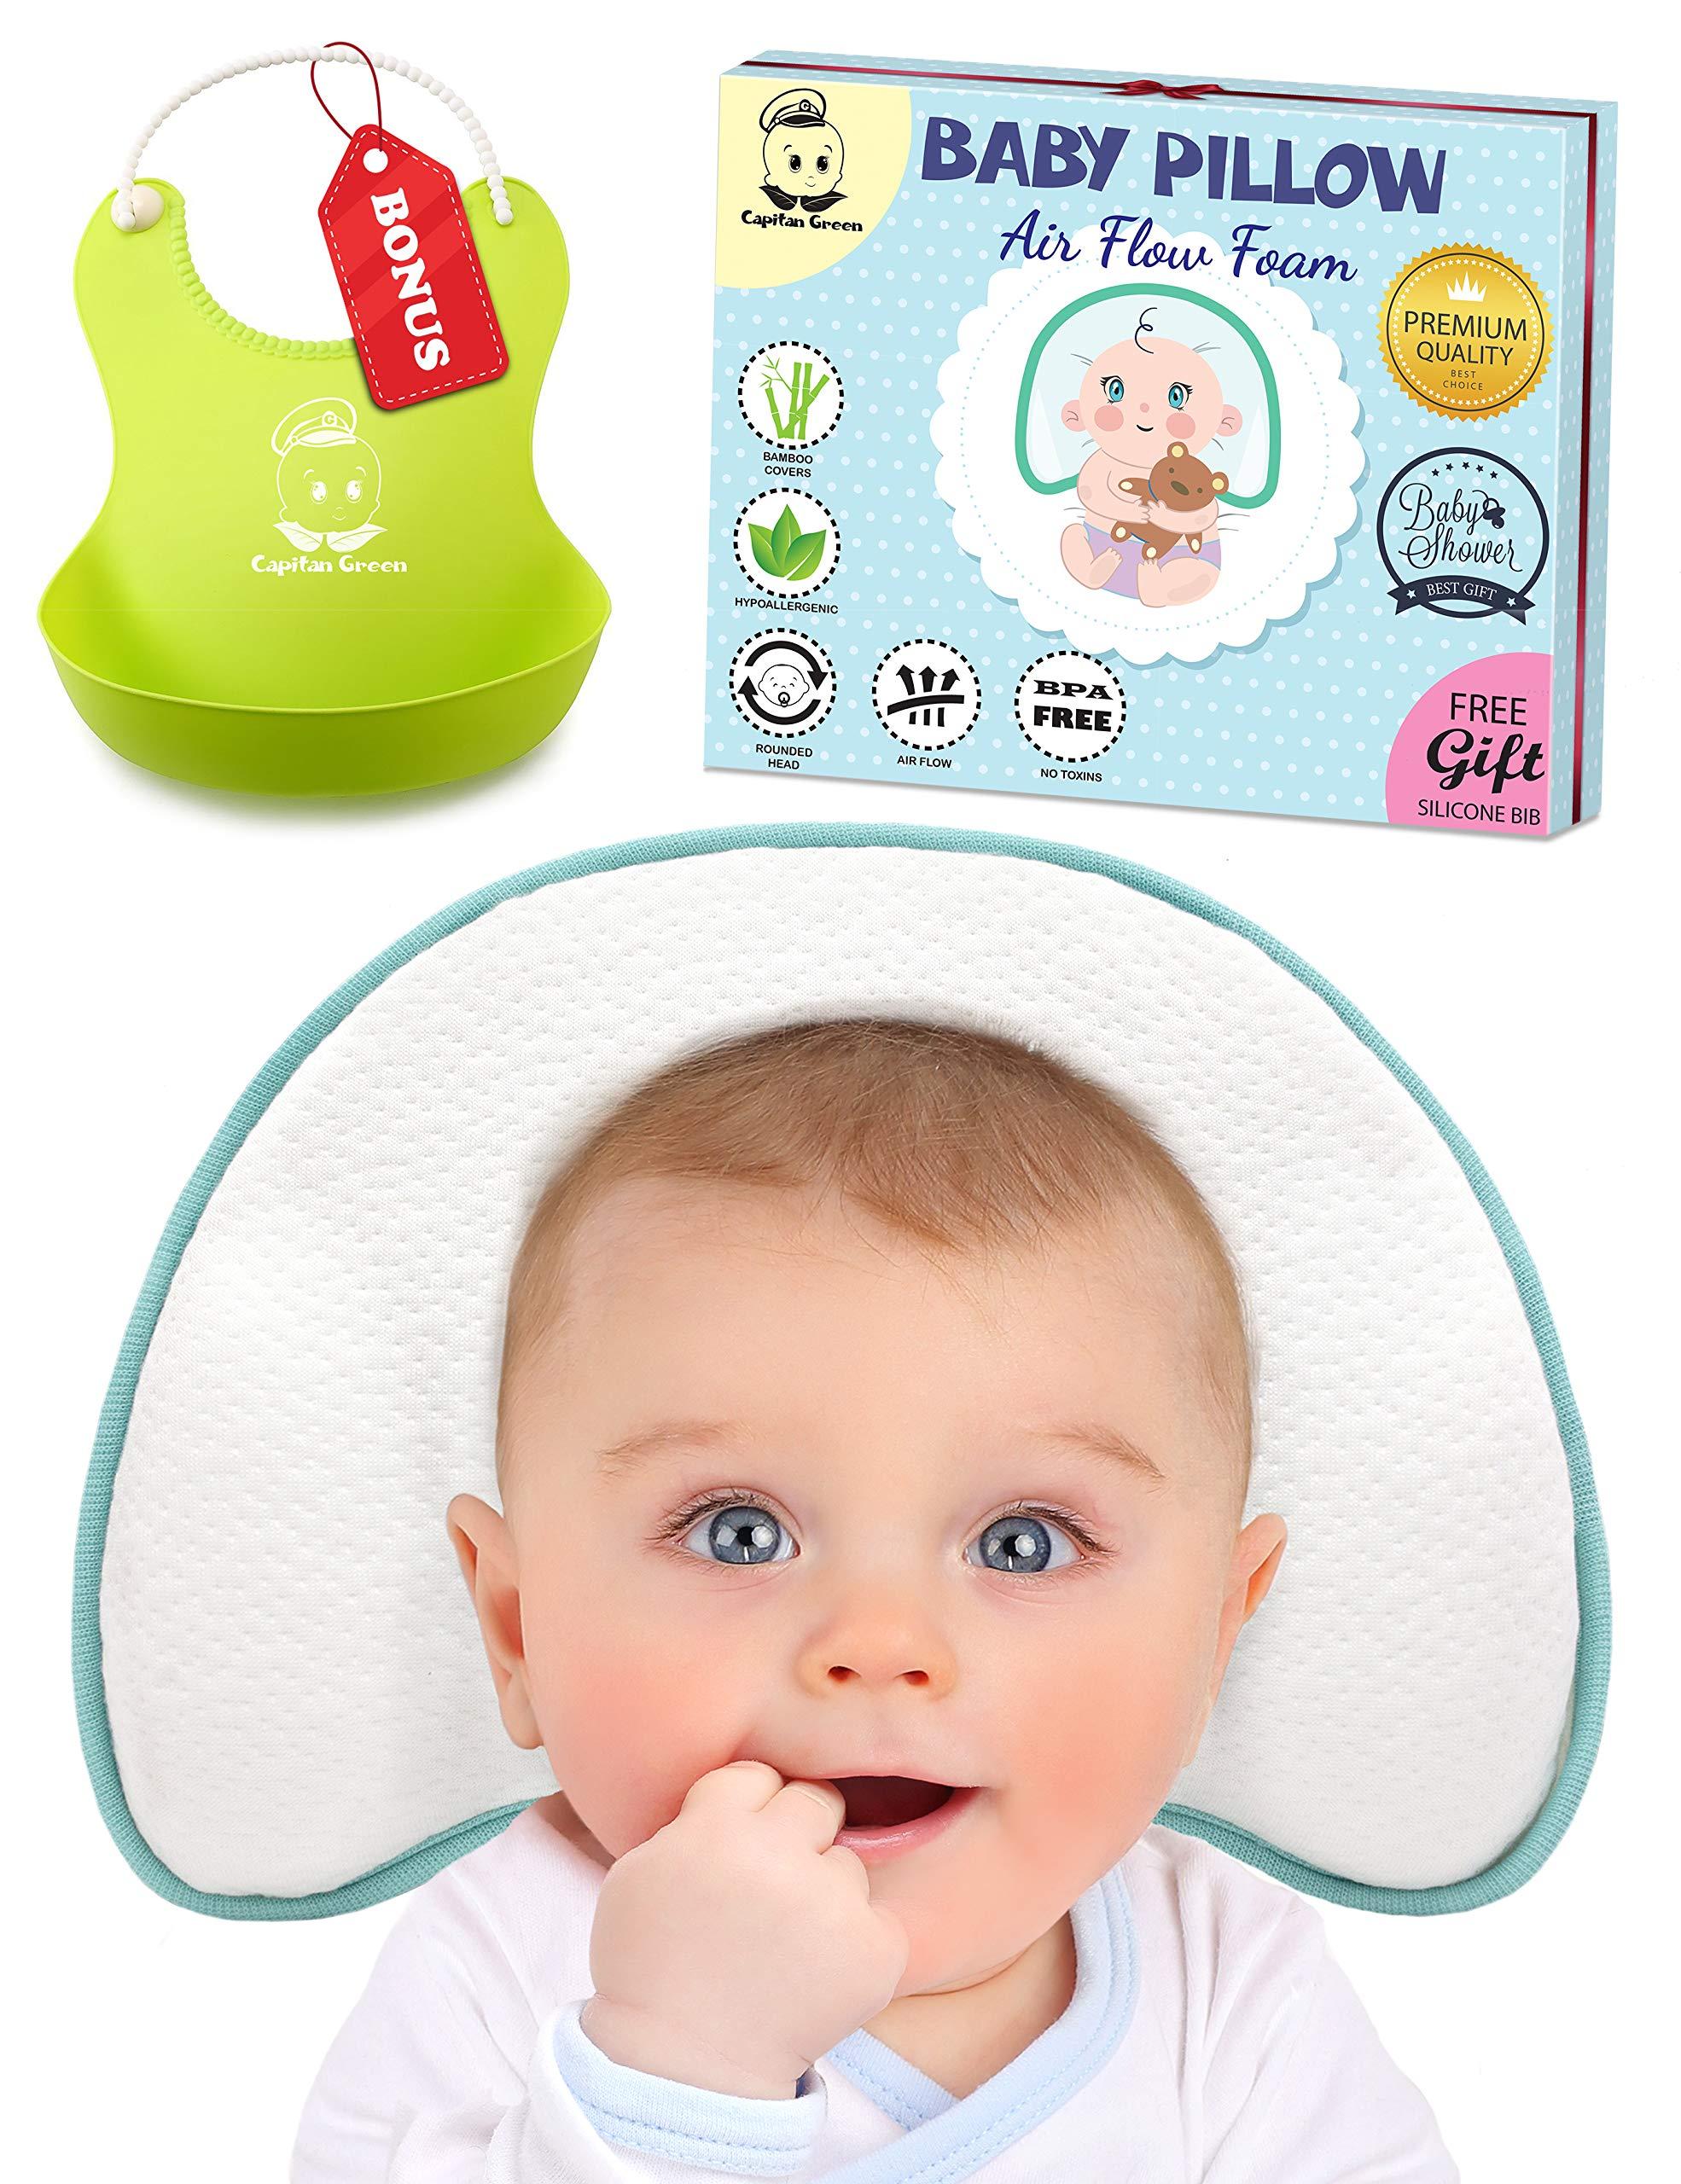 Infant Baby Flat Head Pillow | Sleeping Memory Foam Cushion for Newborn — Head Shaping & Correcting Flat Spot Syndrome | 2 Luxurious Bamboo Pillowcases & Bonus Bibs Included by Capitan Green